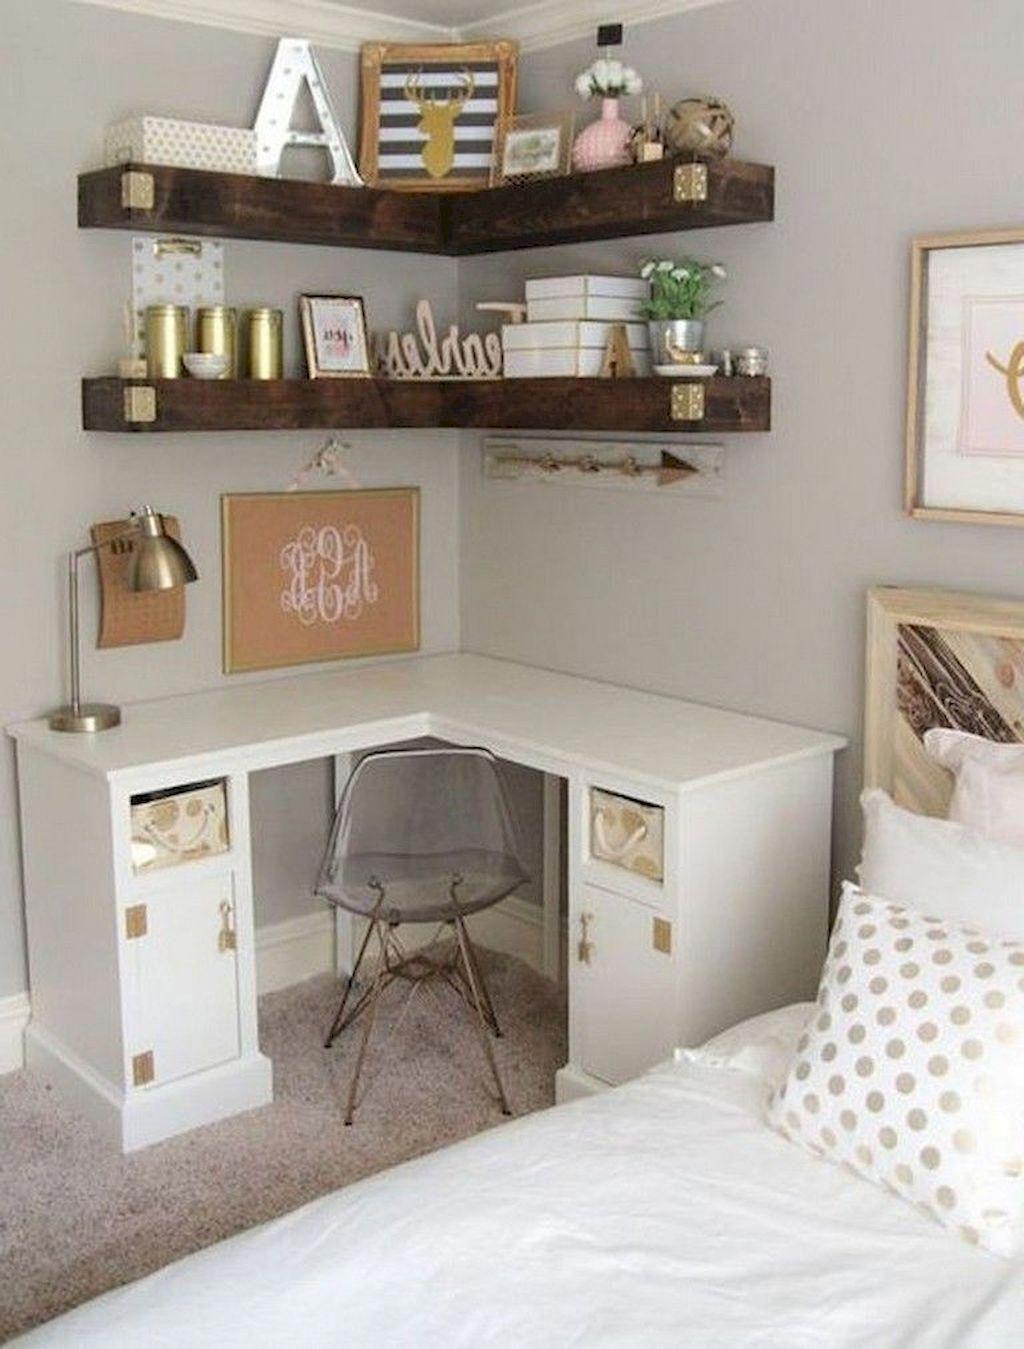 10x10 Room Design: Pin On Bedroom Ideas Fresh Decor